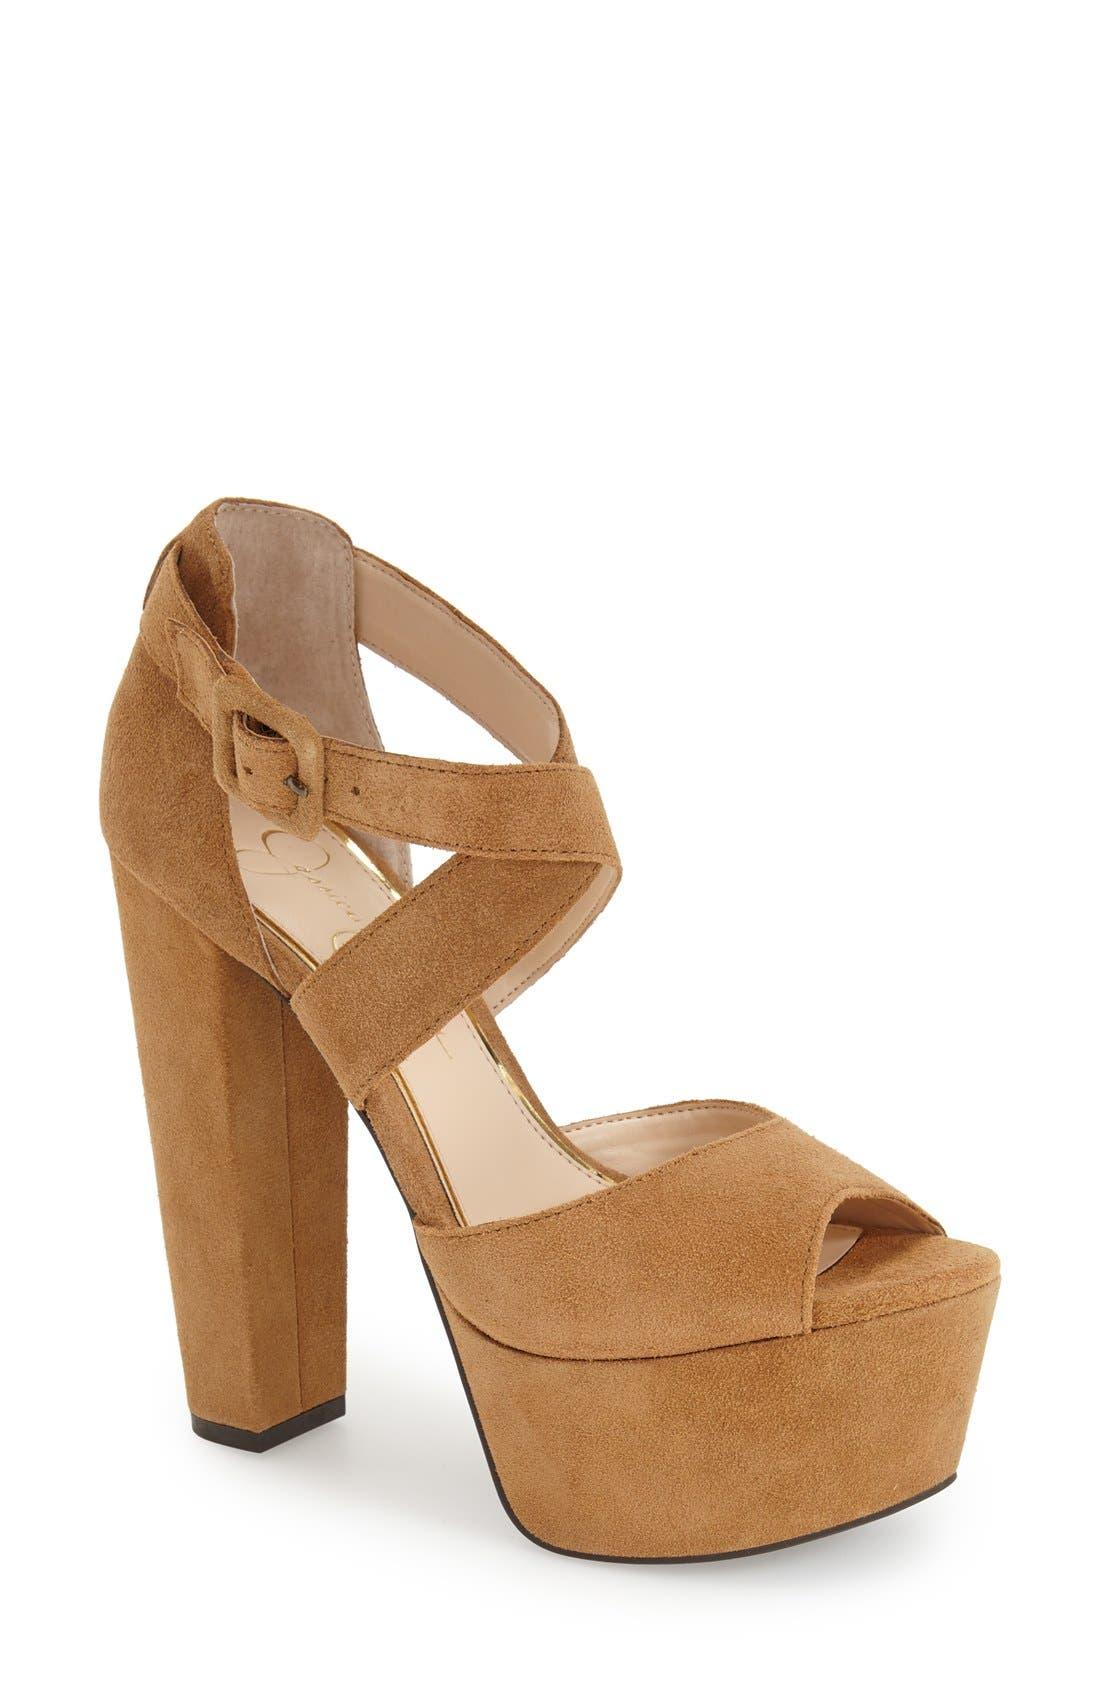 Main Image - Jessica Simpson 'Derian' Platform Sandal (Women)